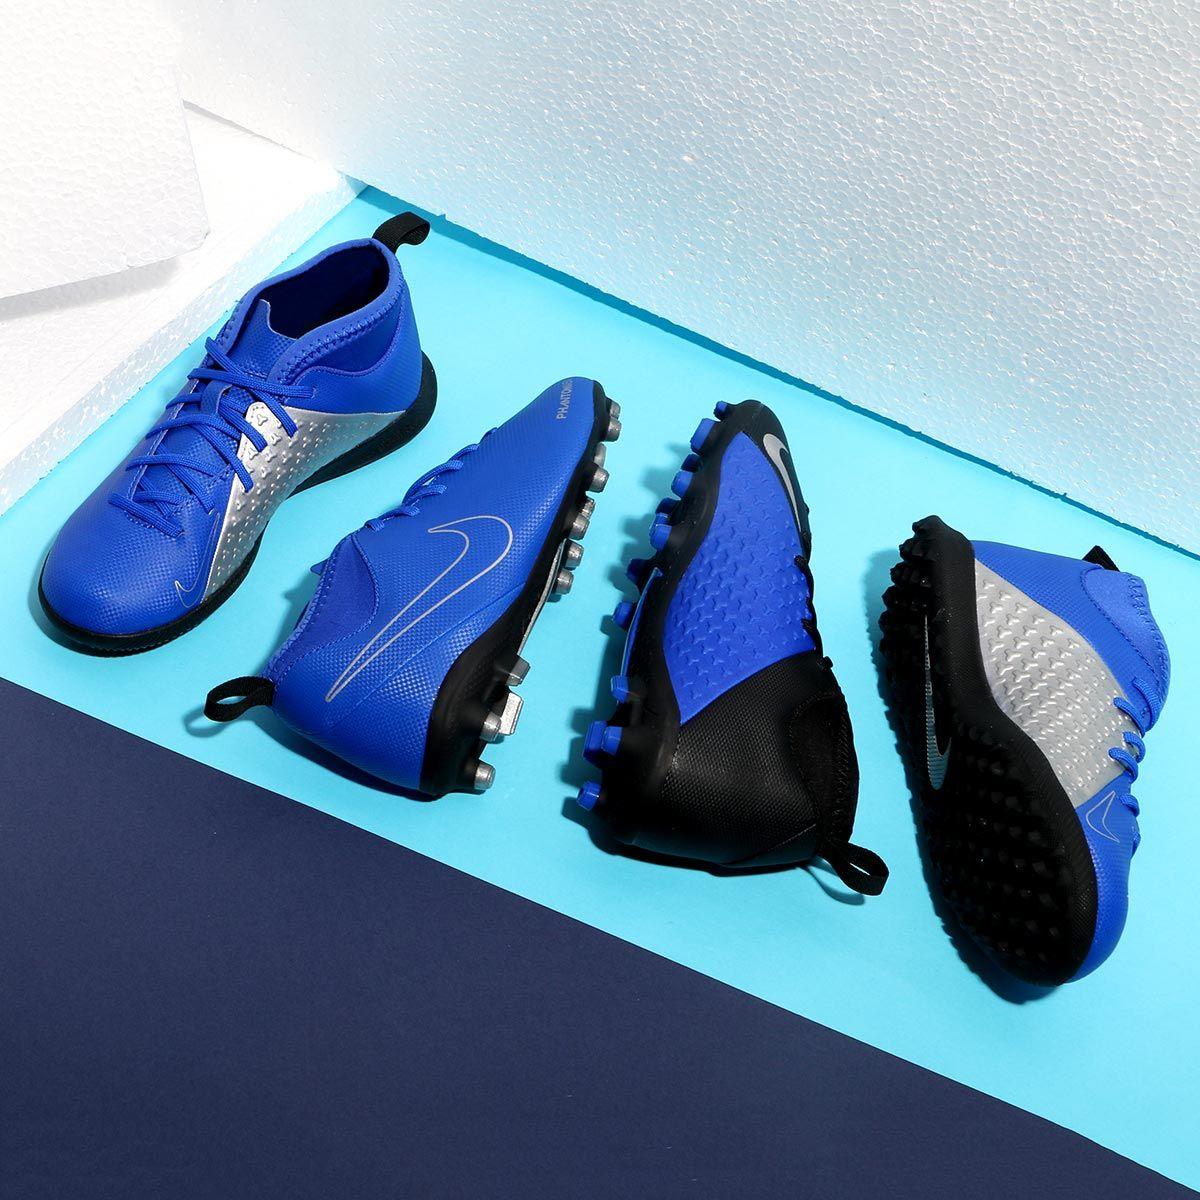 Botas de fútbol infantiles Nike Phantom Vision Club. En futbolmania kids  encontrarás este modelo con suela IC adb90e7f739b1